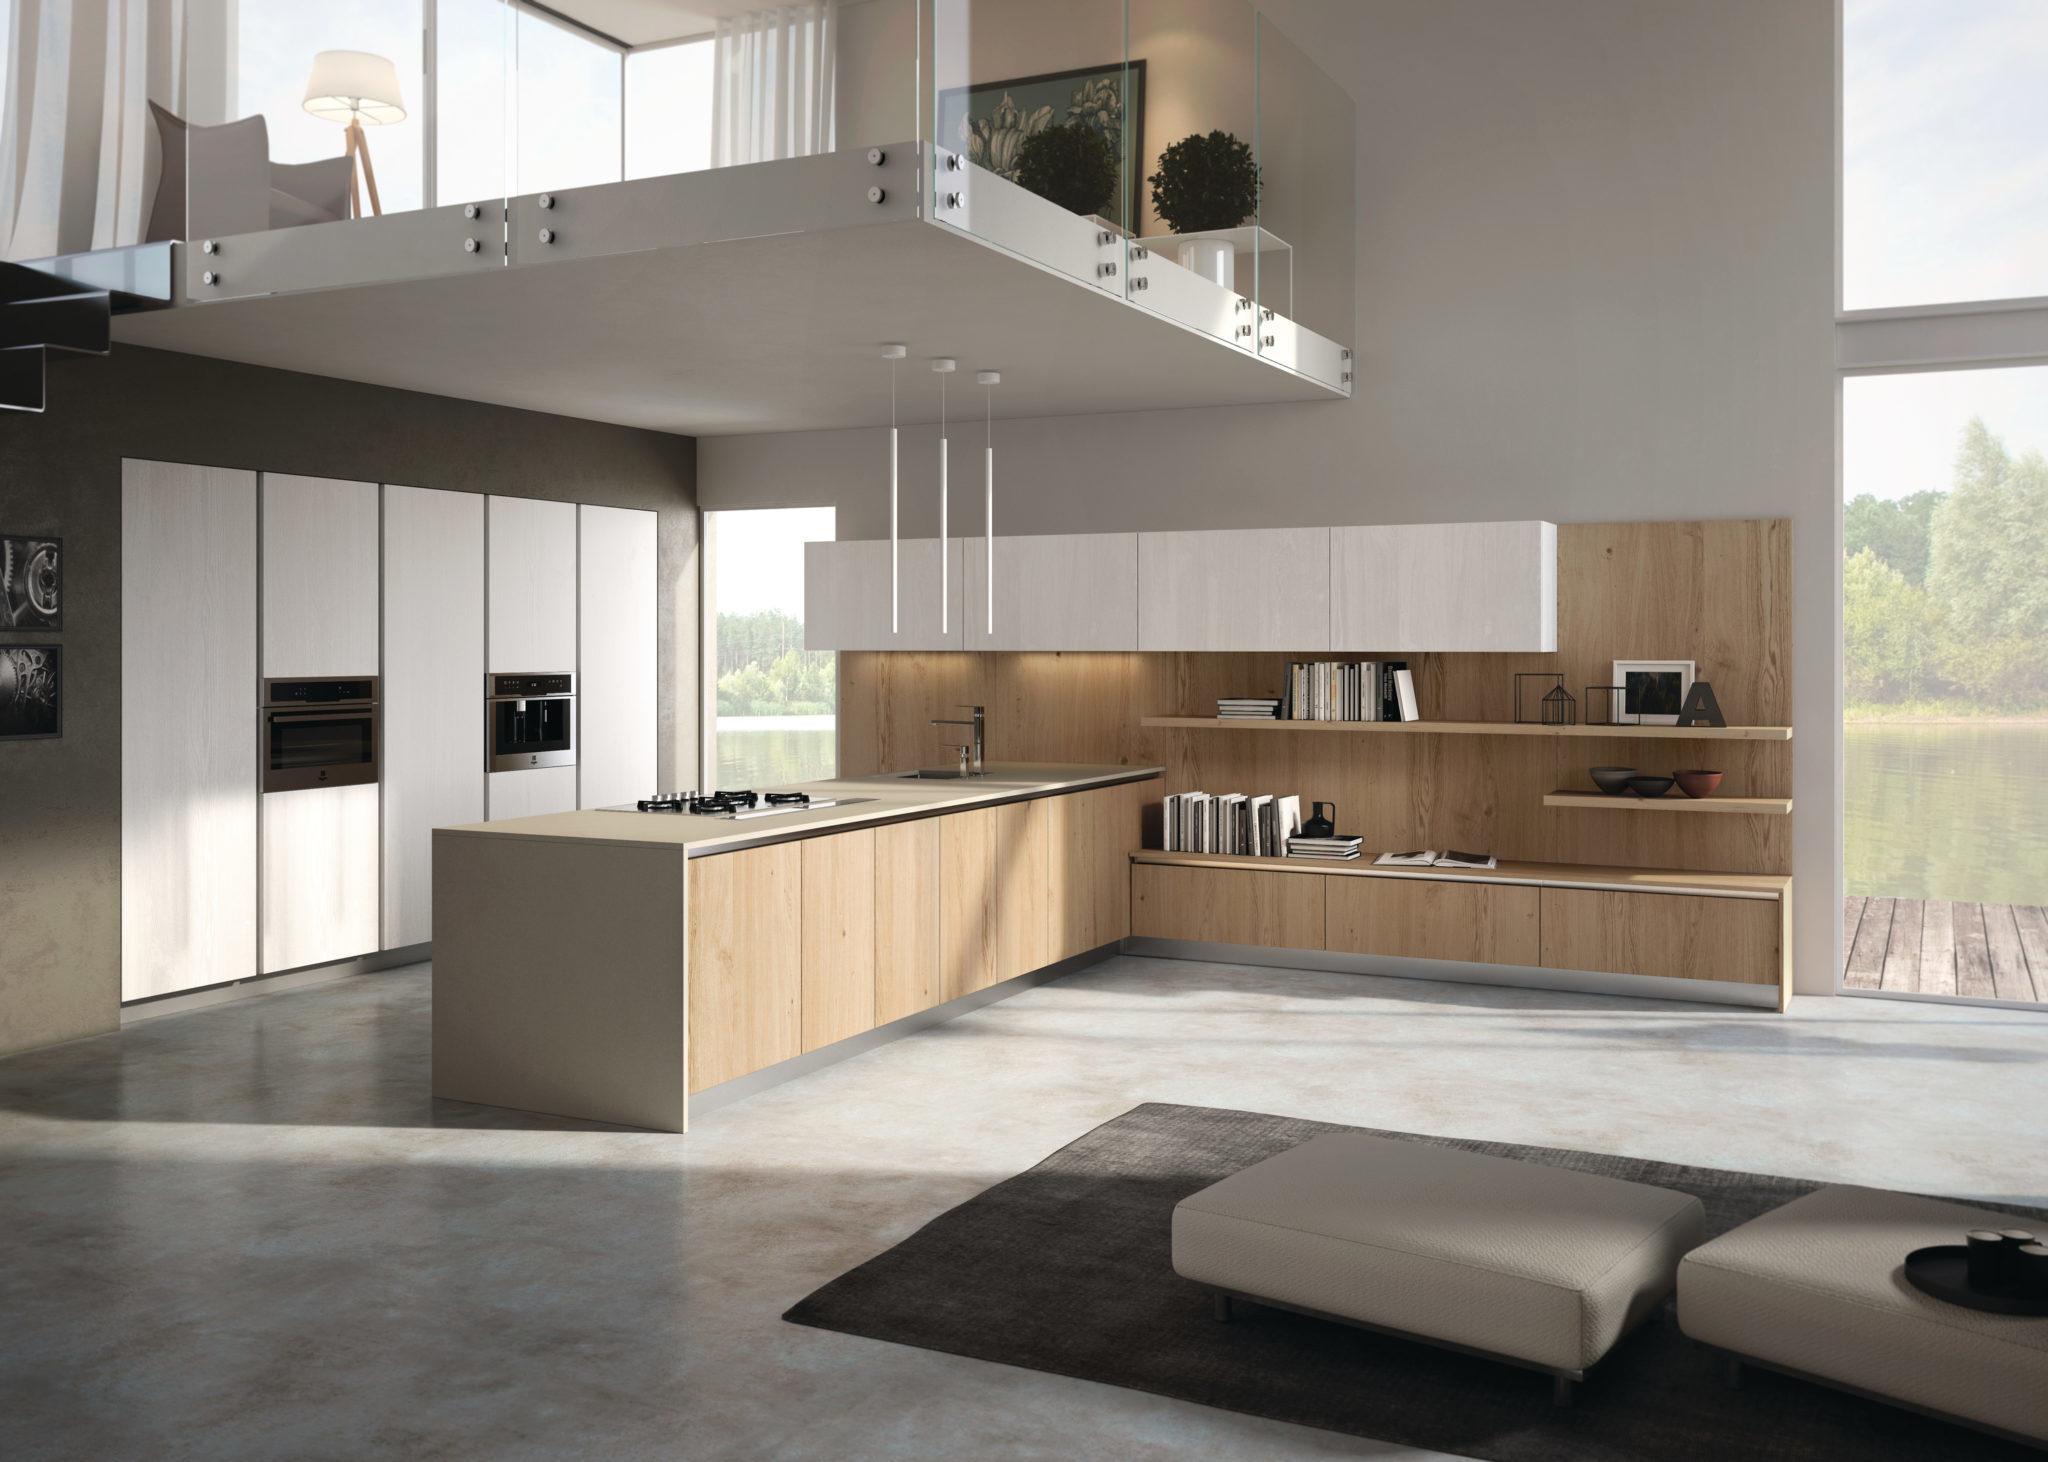 Lp Concept Cuisine 4306RG16 URBAN LINE R44 1 1